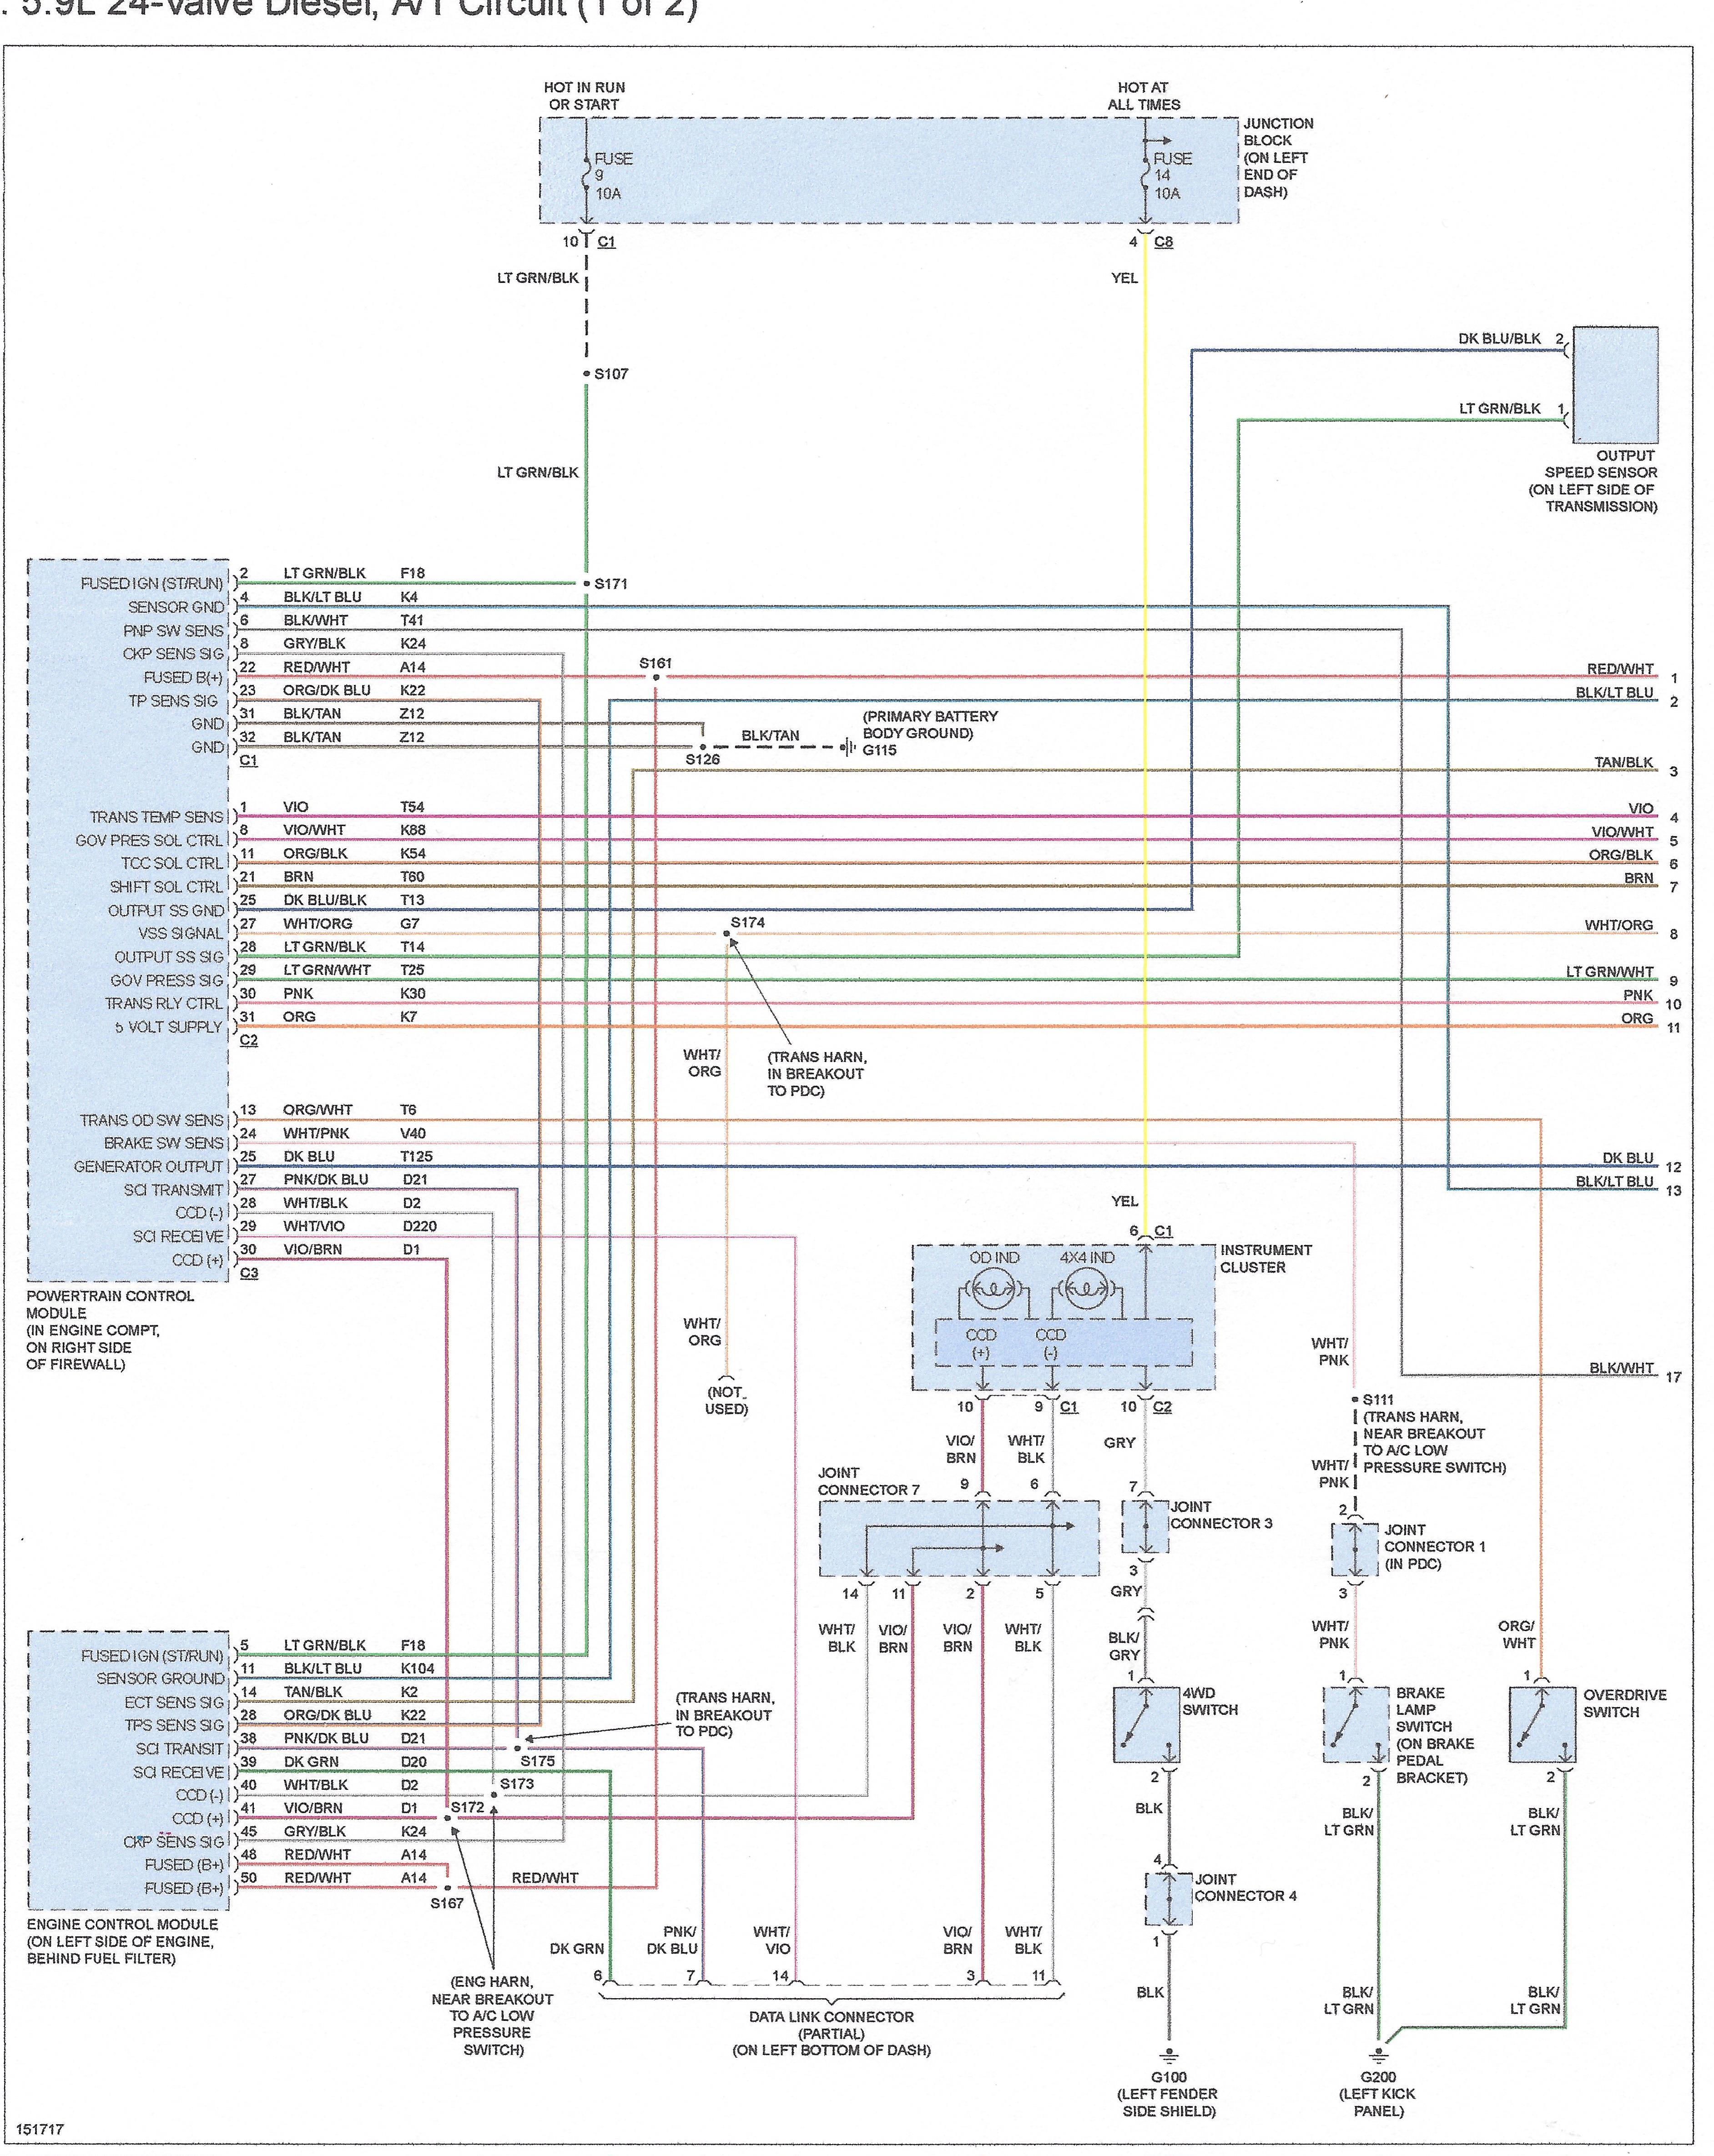 solving dodge diesel tcc lockup issues by eliminating connectors rh certifiedtransmission wordpress com 2012 dodge ram wiring diagram dodge ram light wiring  [ 3768 x 4740 Pixel ]